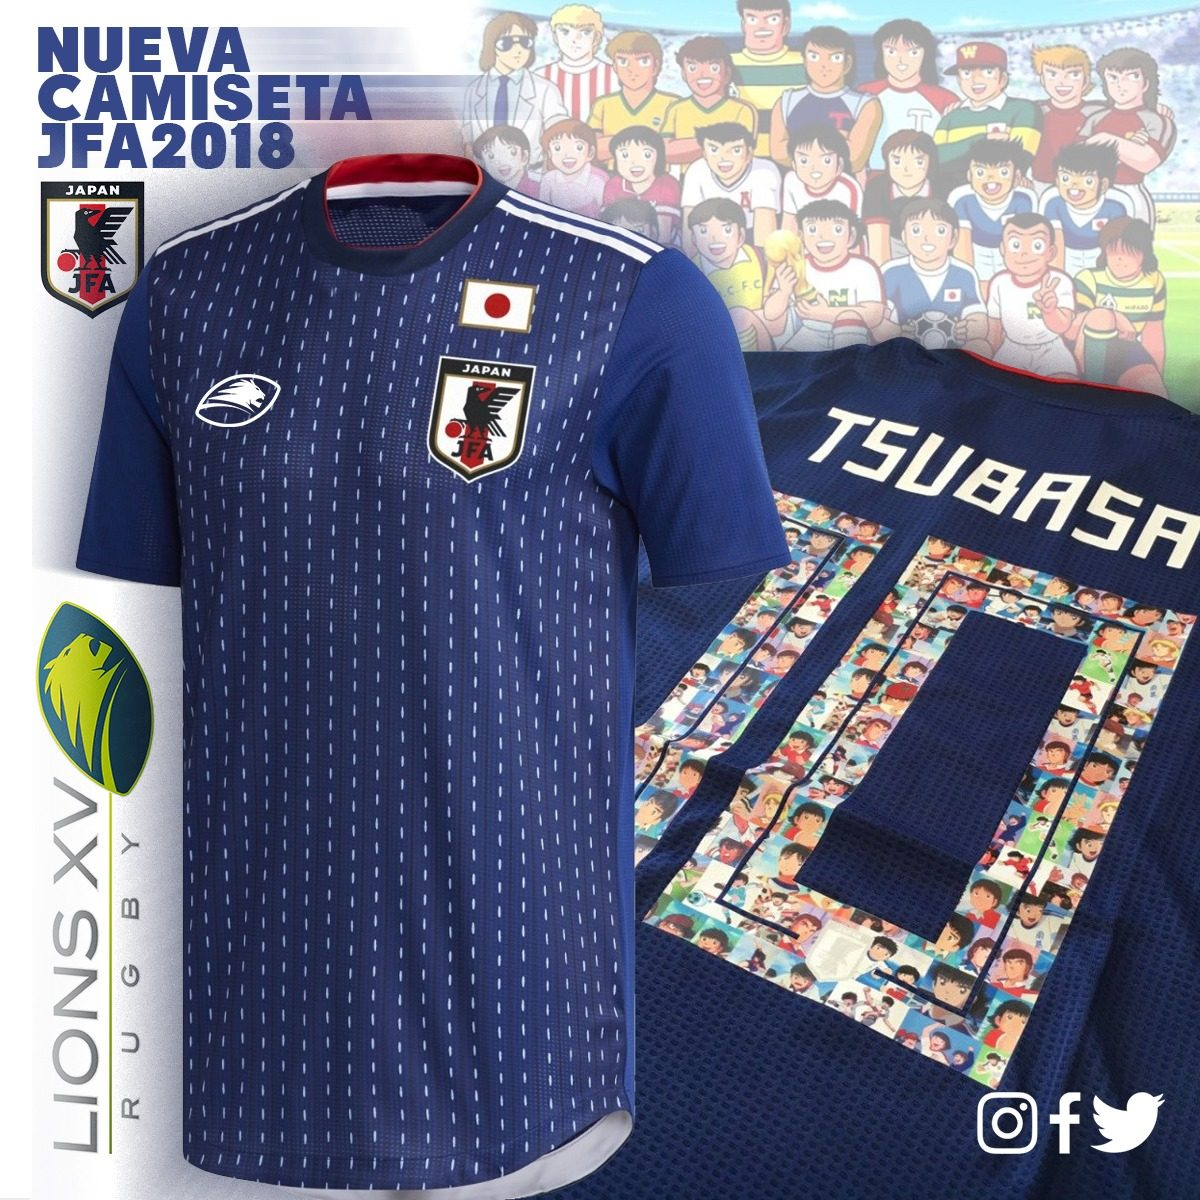 Camiseta De Futbol Supercampeones Adulto Niño Lions Xv -   1.190 9138ad9f0db49